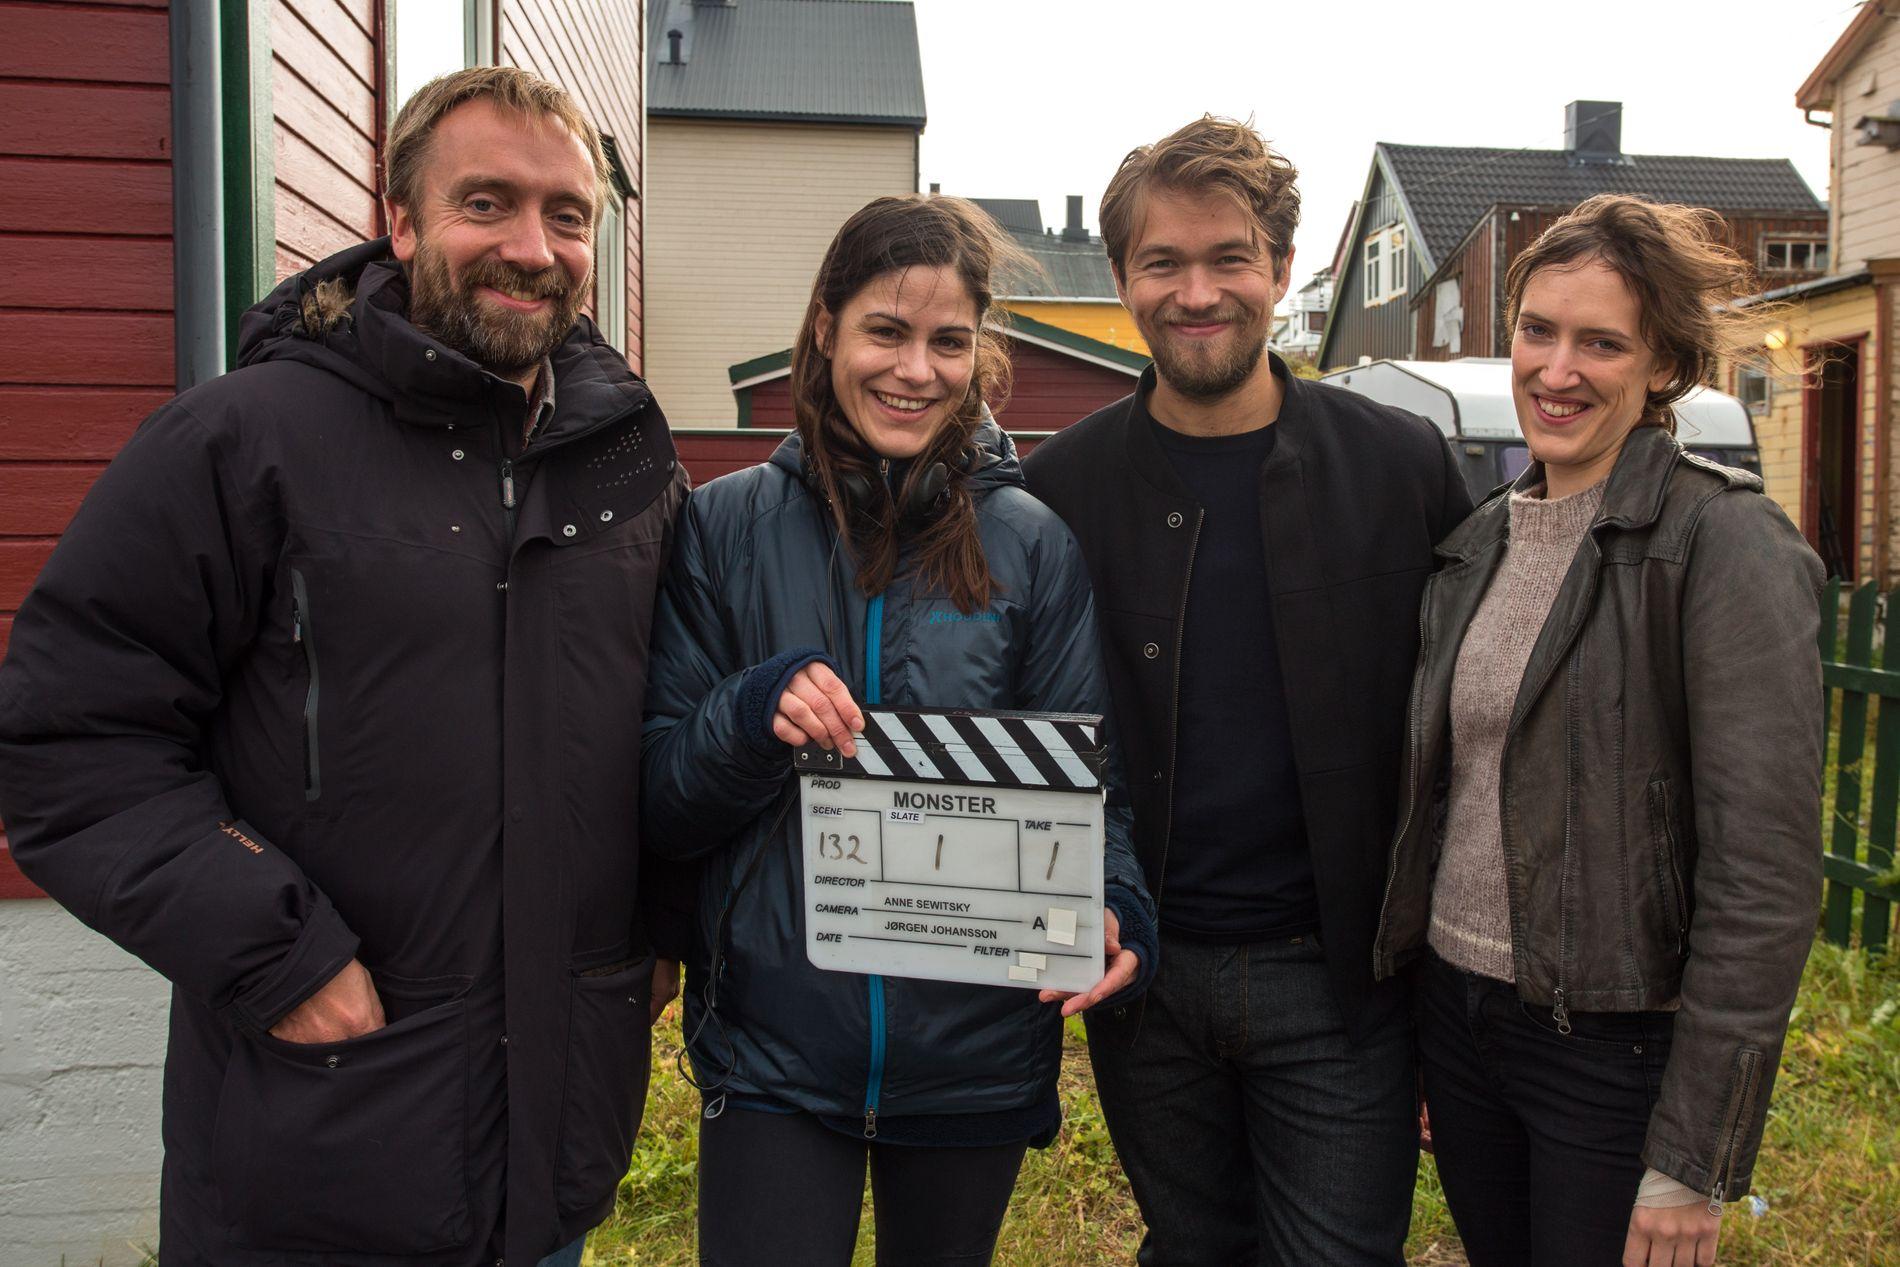 INNSPILLING: Fra venstre: produsent Lasse Greve Alsos, regissør Anne Sewitsky, og skuespillerne Jakob Oftebro og Ingvild Holthe Bygdnes.